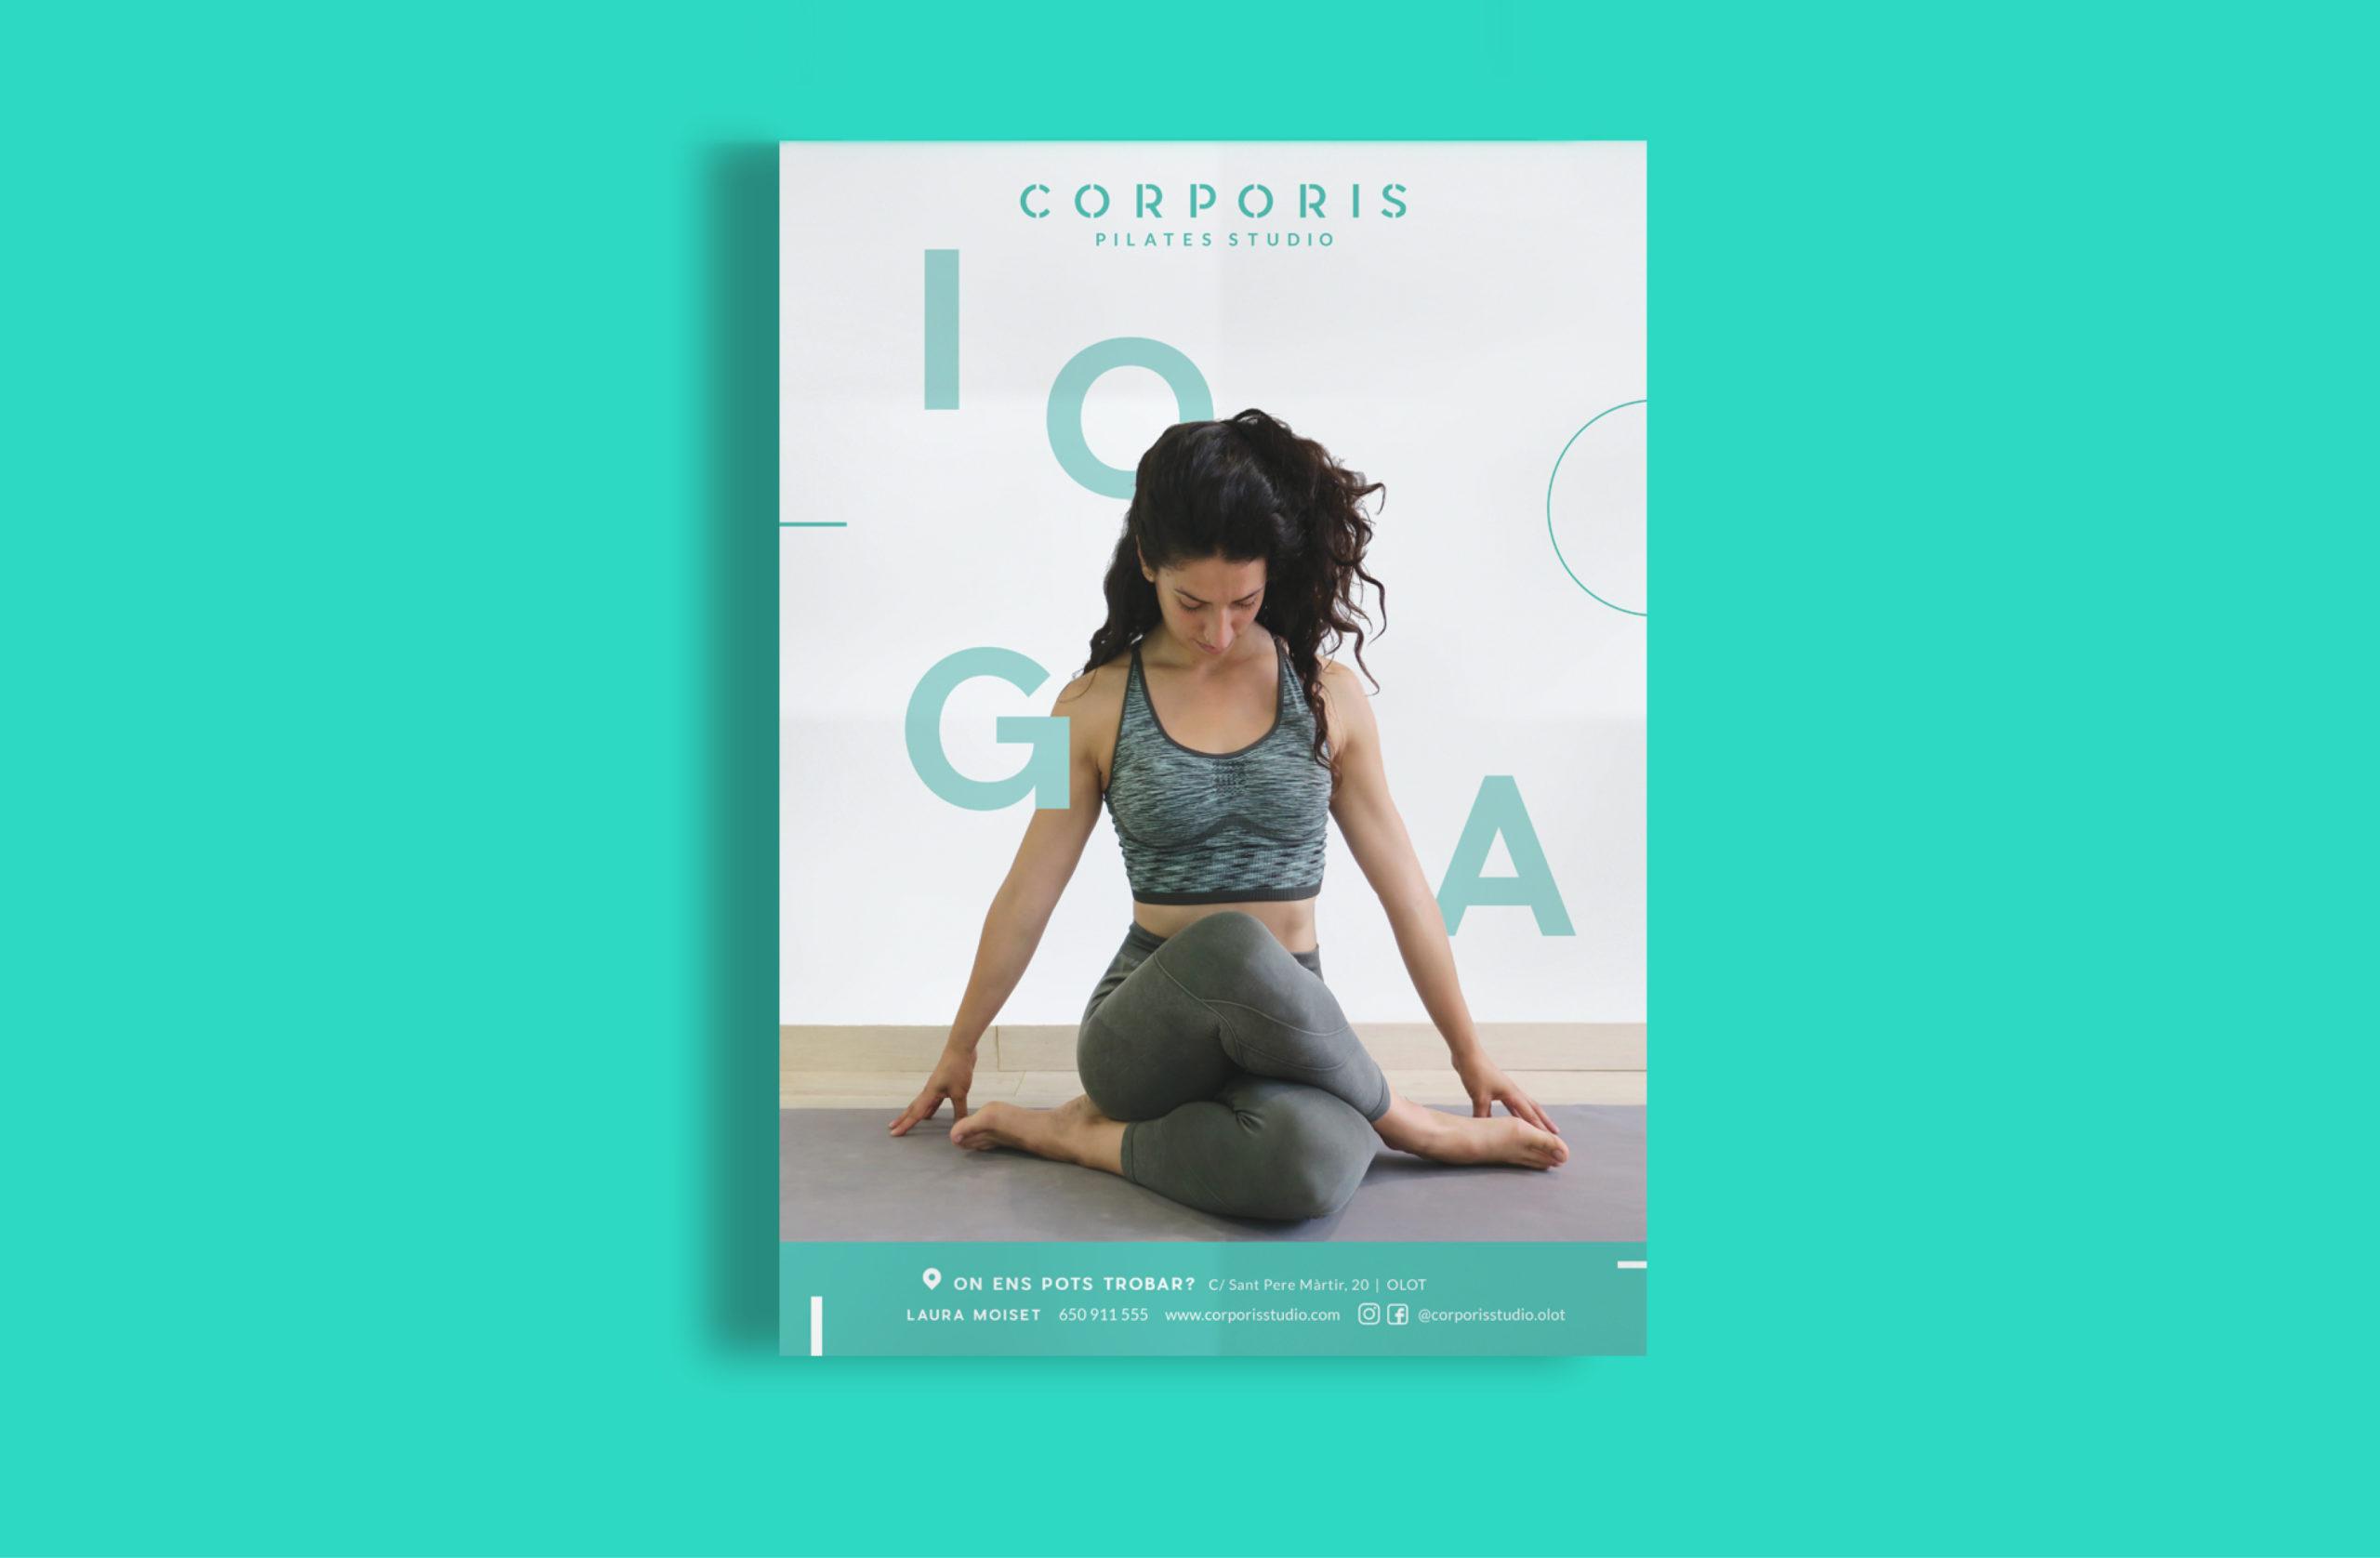 Corporis 1680×1100 ioga